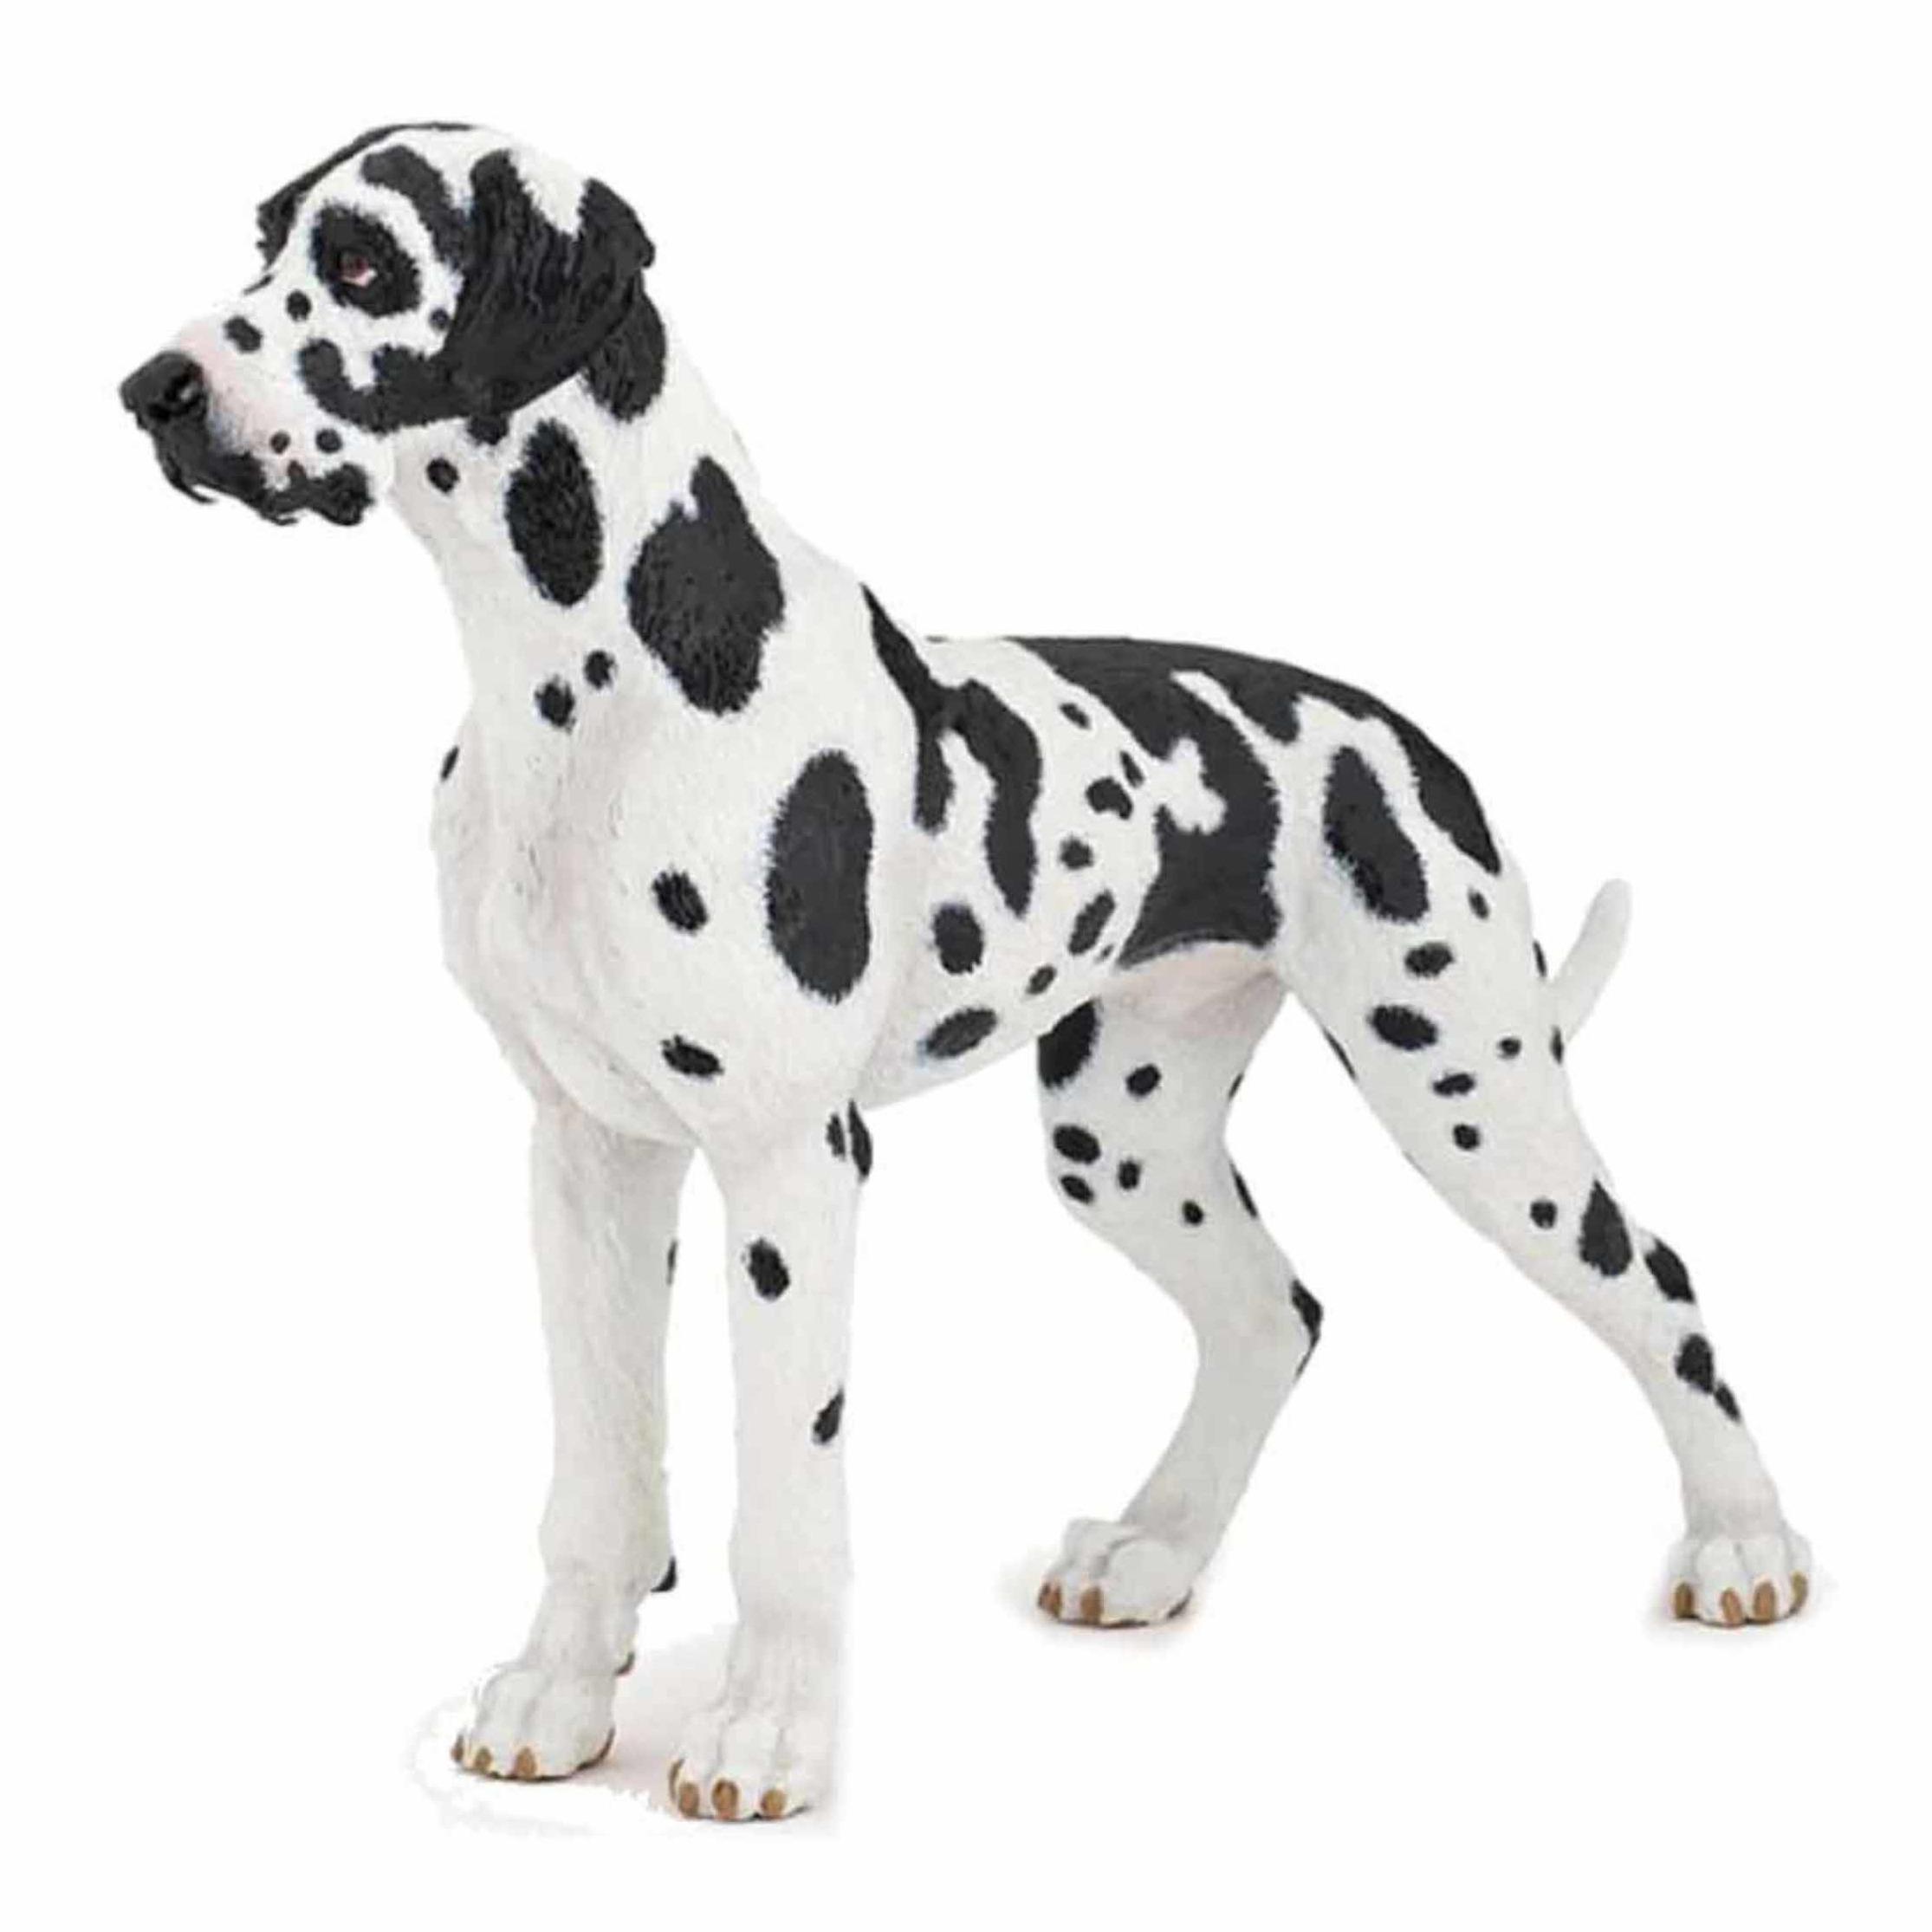 Plastic Deense Dog 12 cm